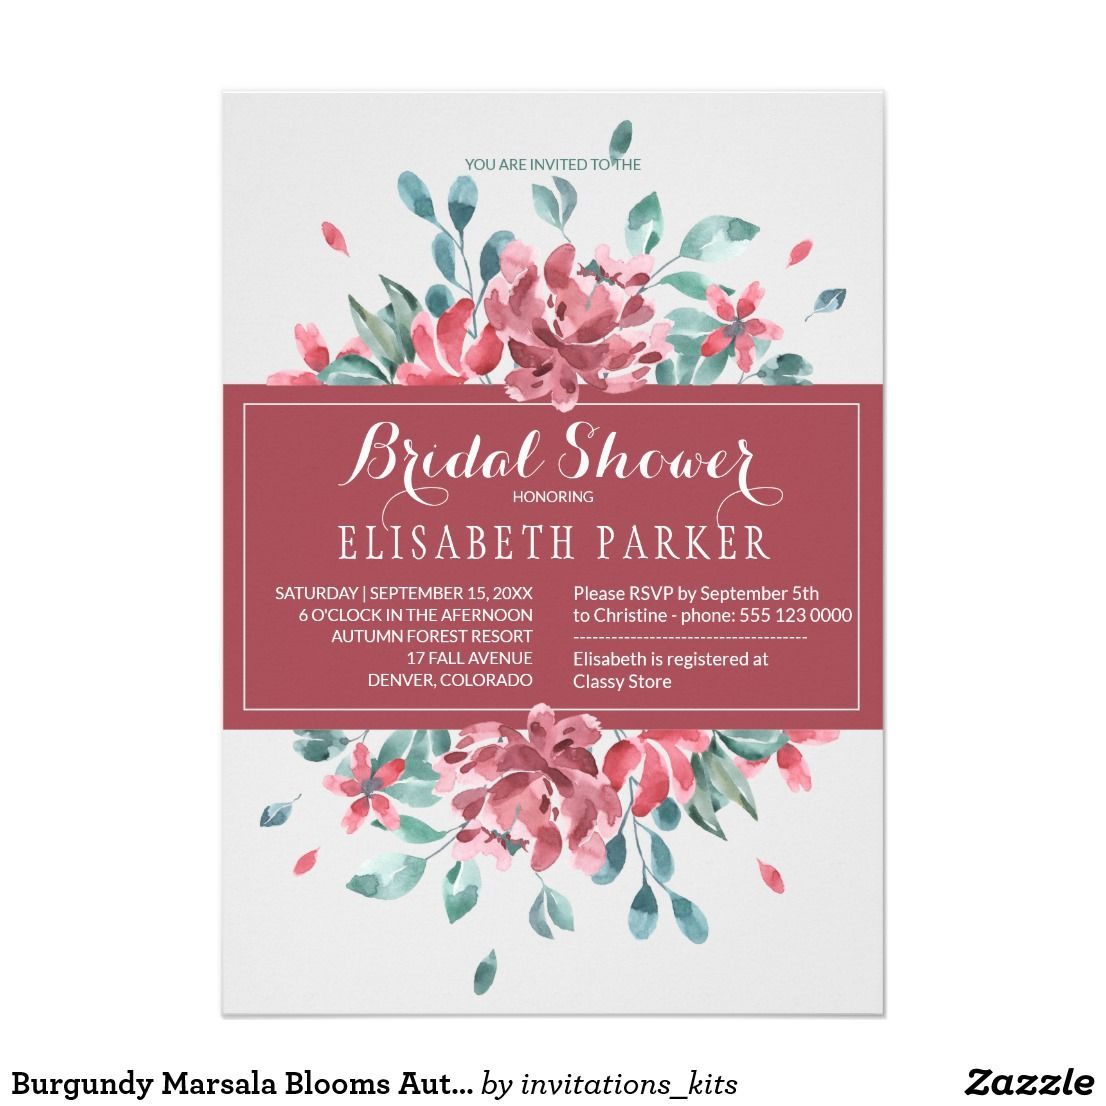 Burgundy Marsala Blooms Autumn Bridal Shower Invitation | Bridal ...